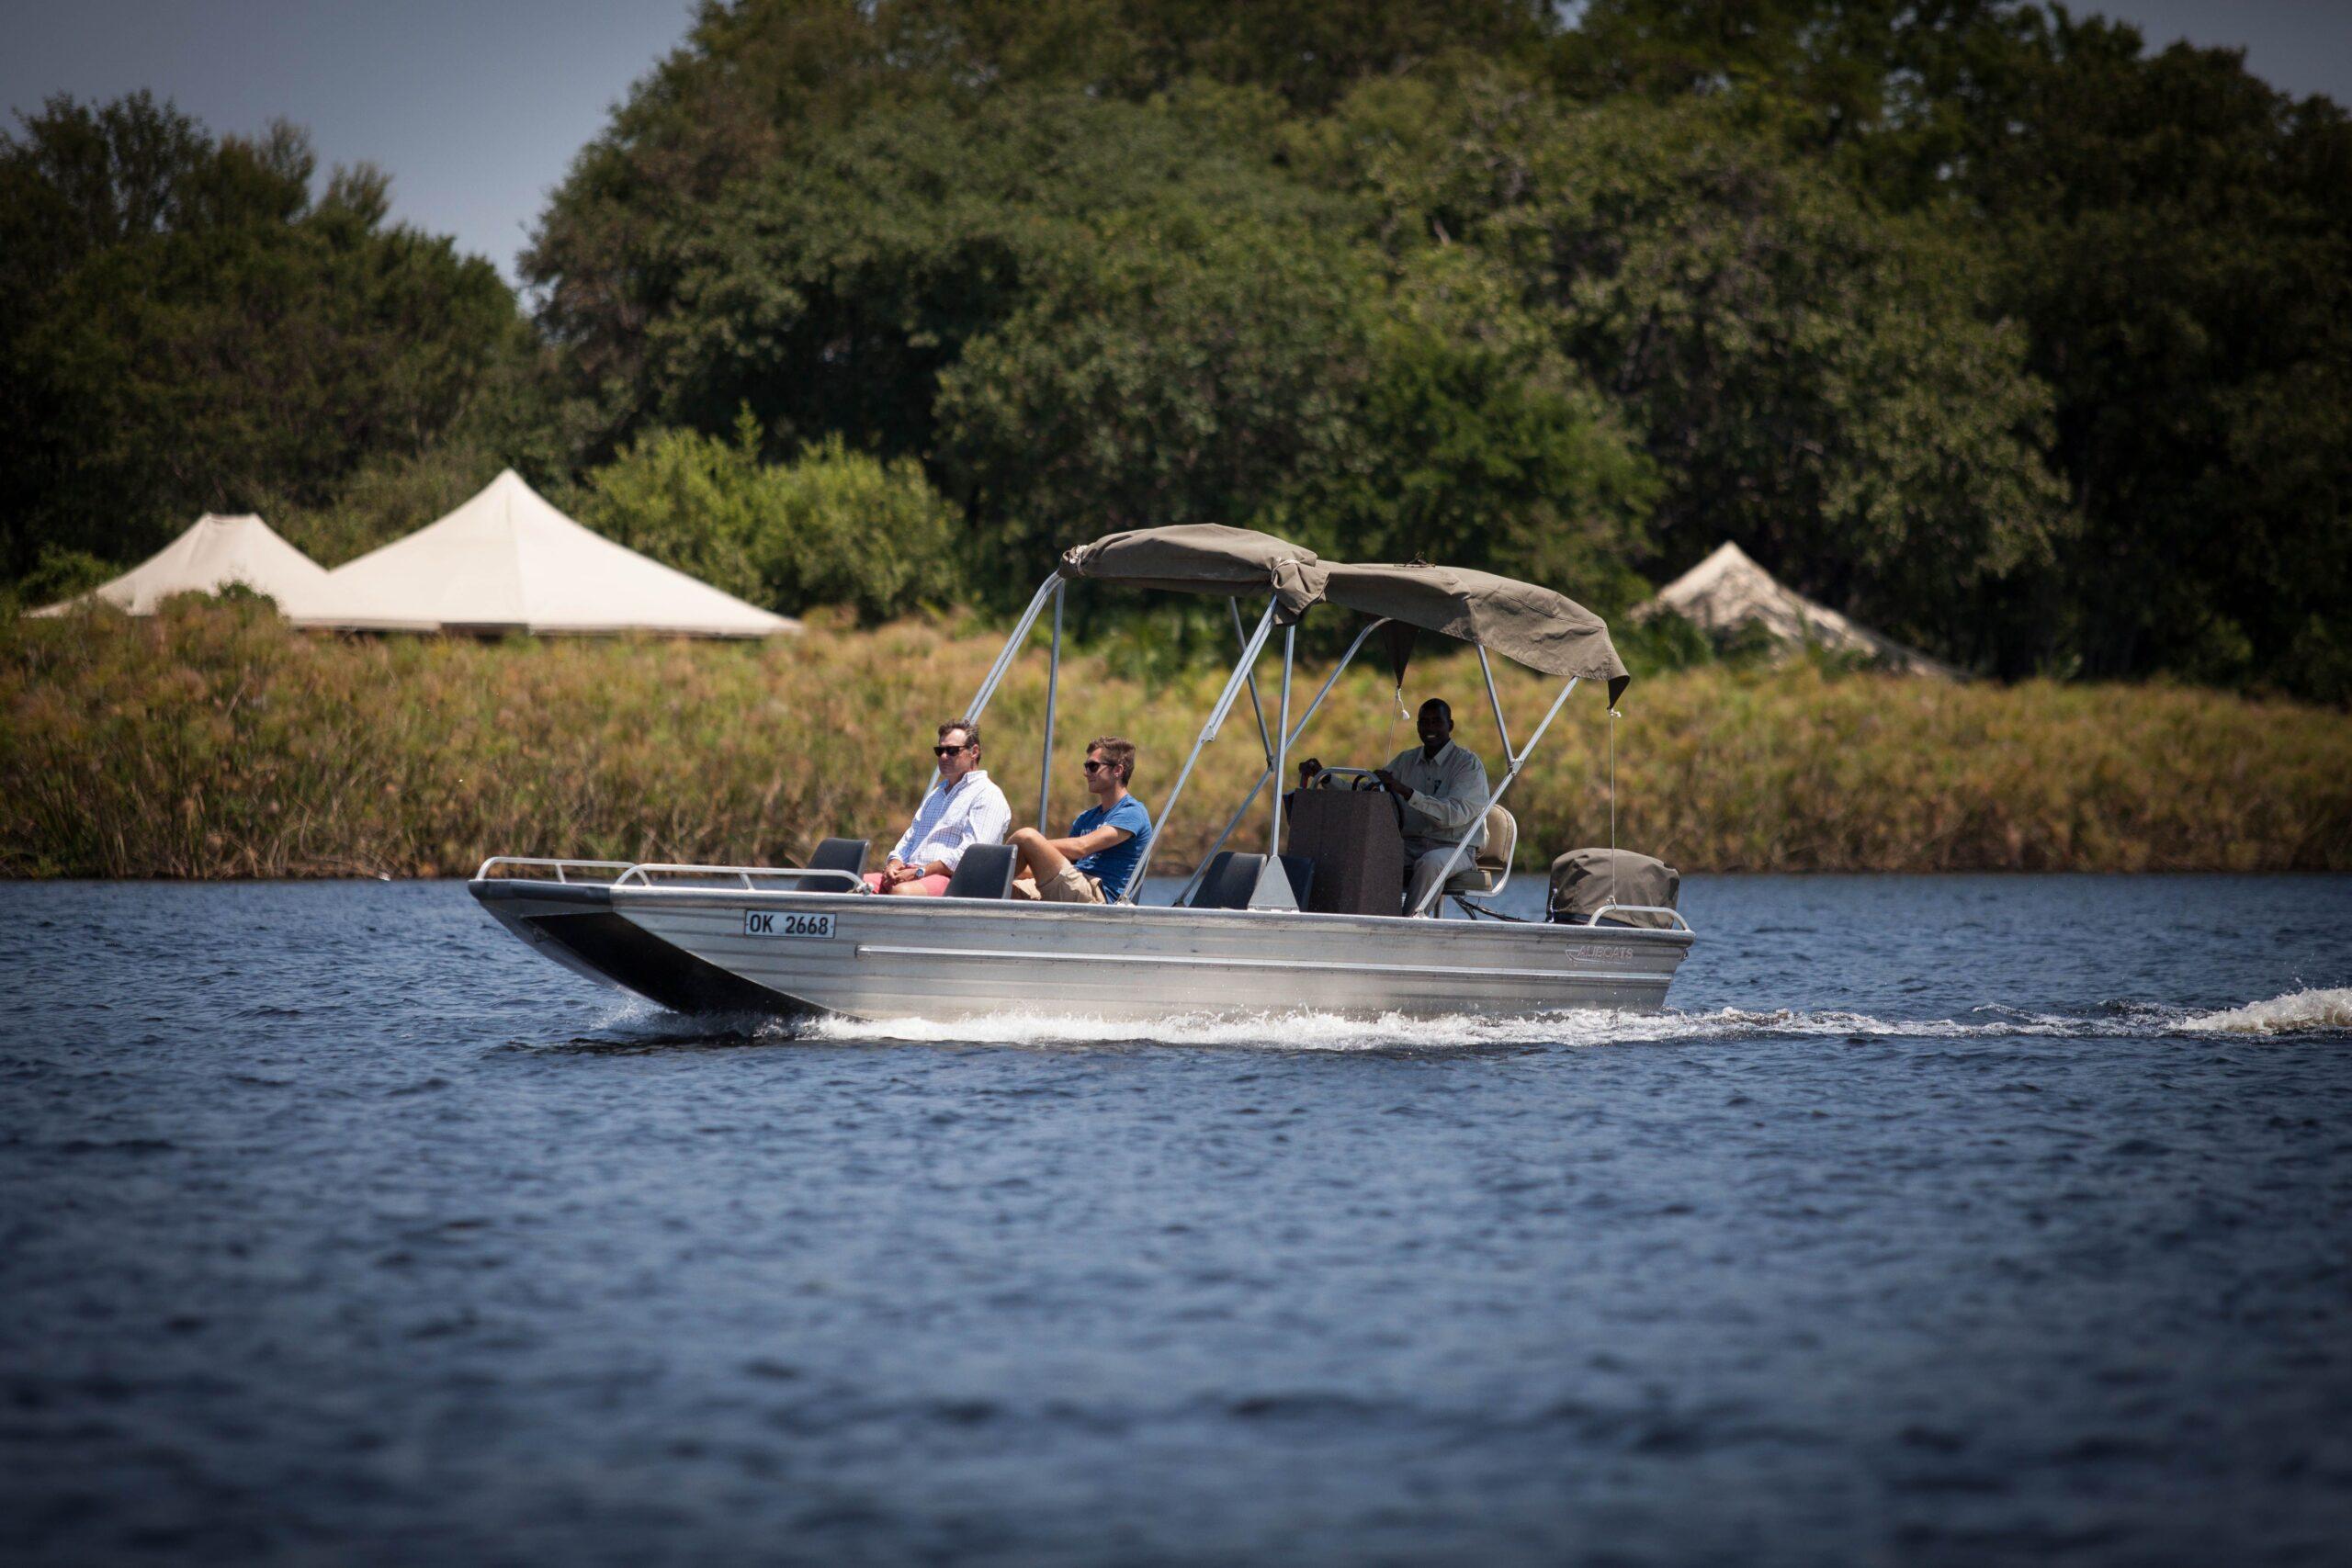 Boat trip through the Okavango Delta